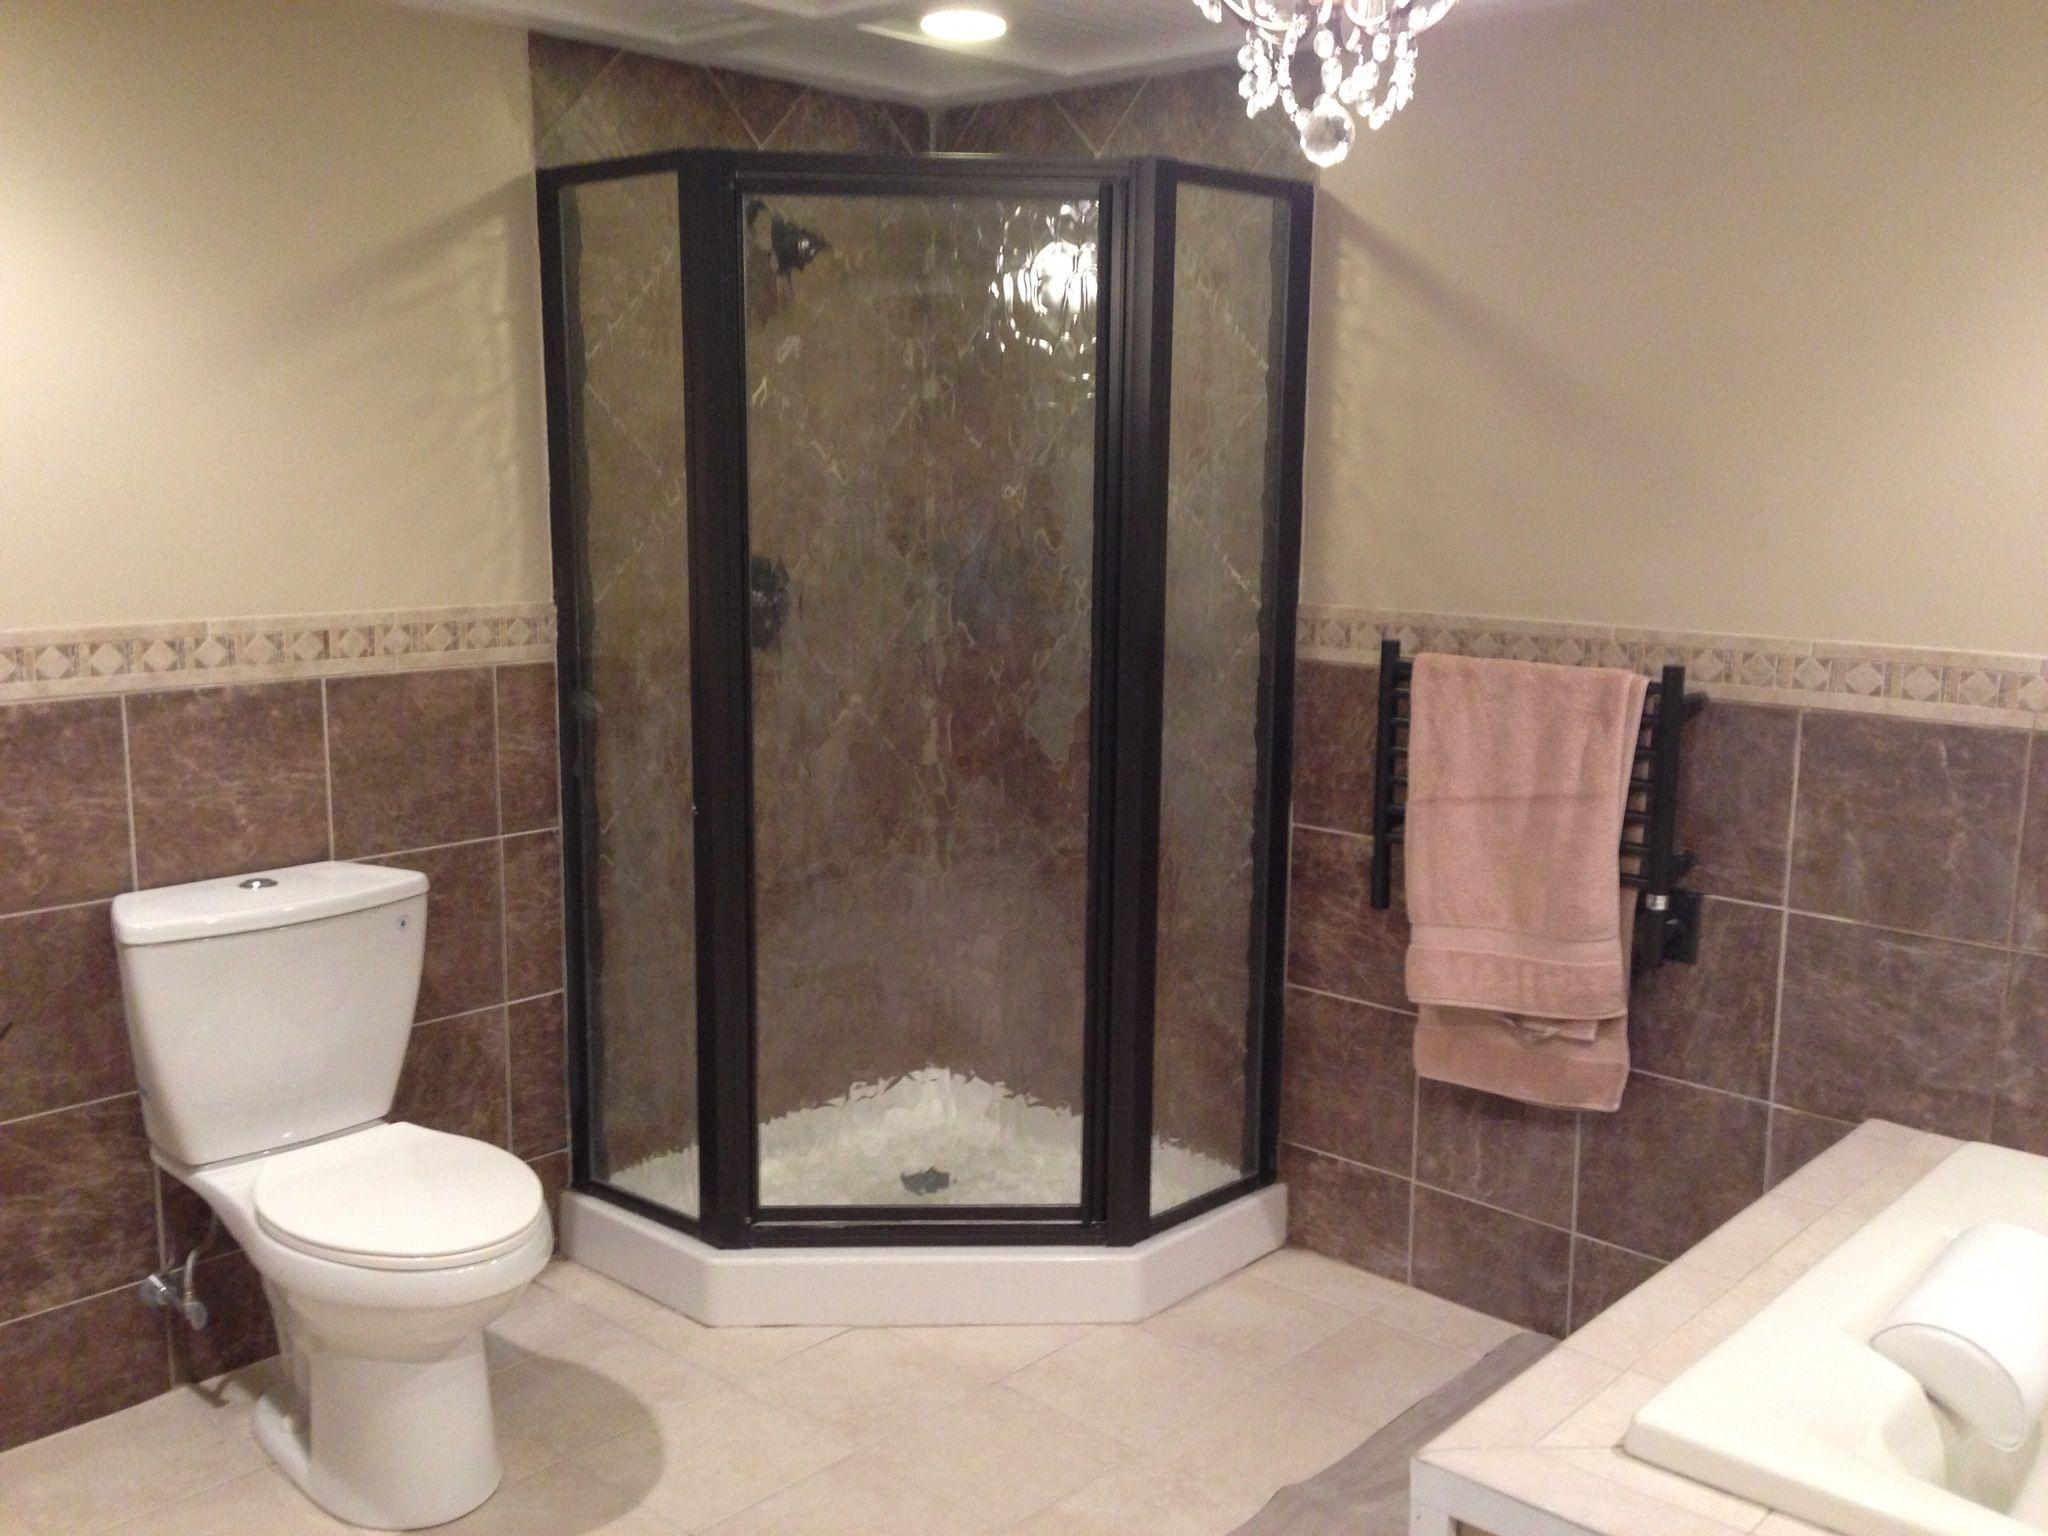 Stand Up Shower Bathroom Bathroom Design Small Home Depot Bathroom Tile Small Bathroom